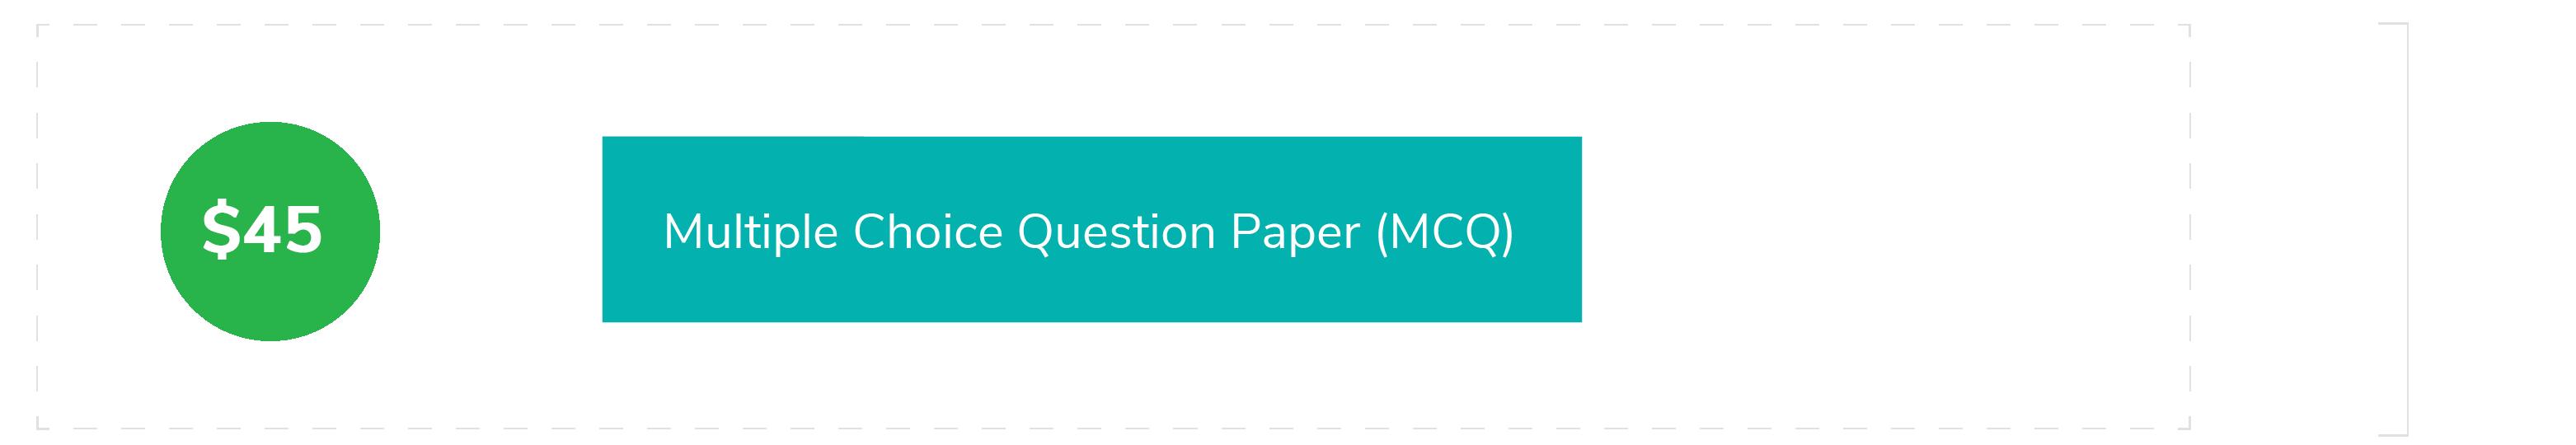 certification-sa-mcq-diagram